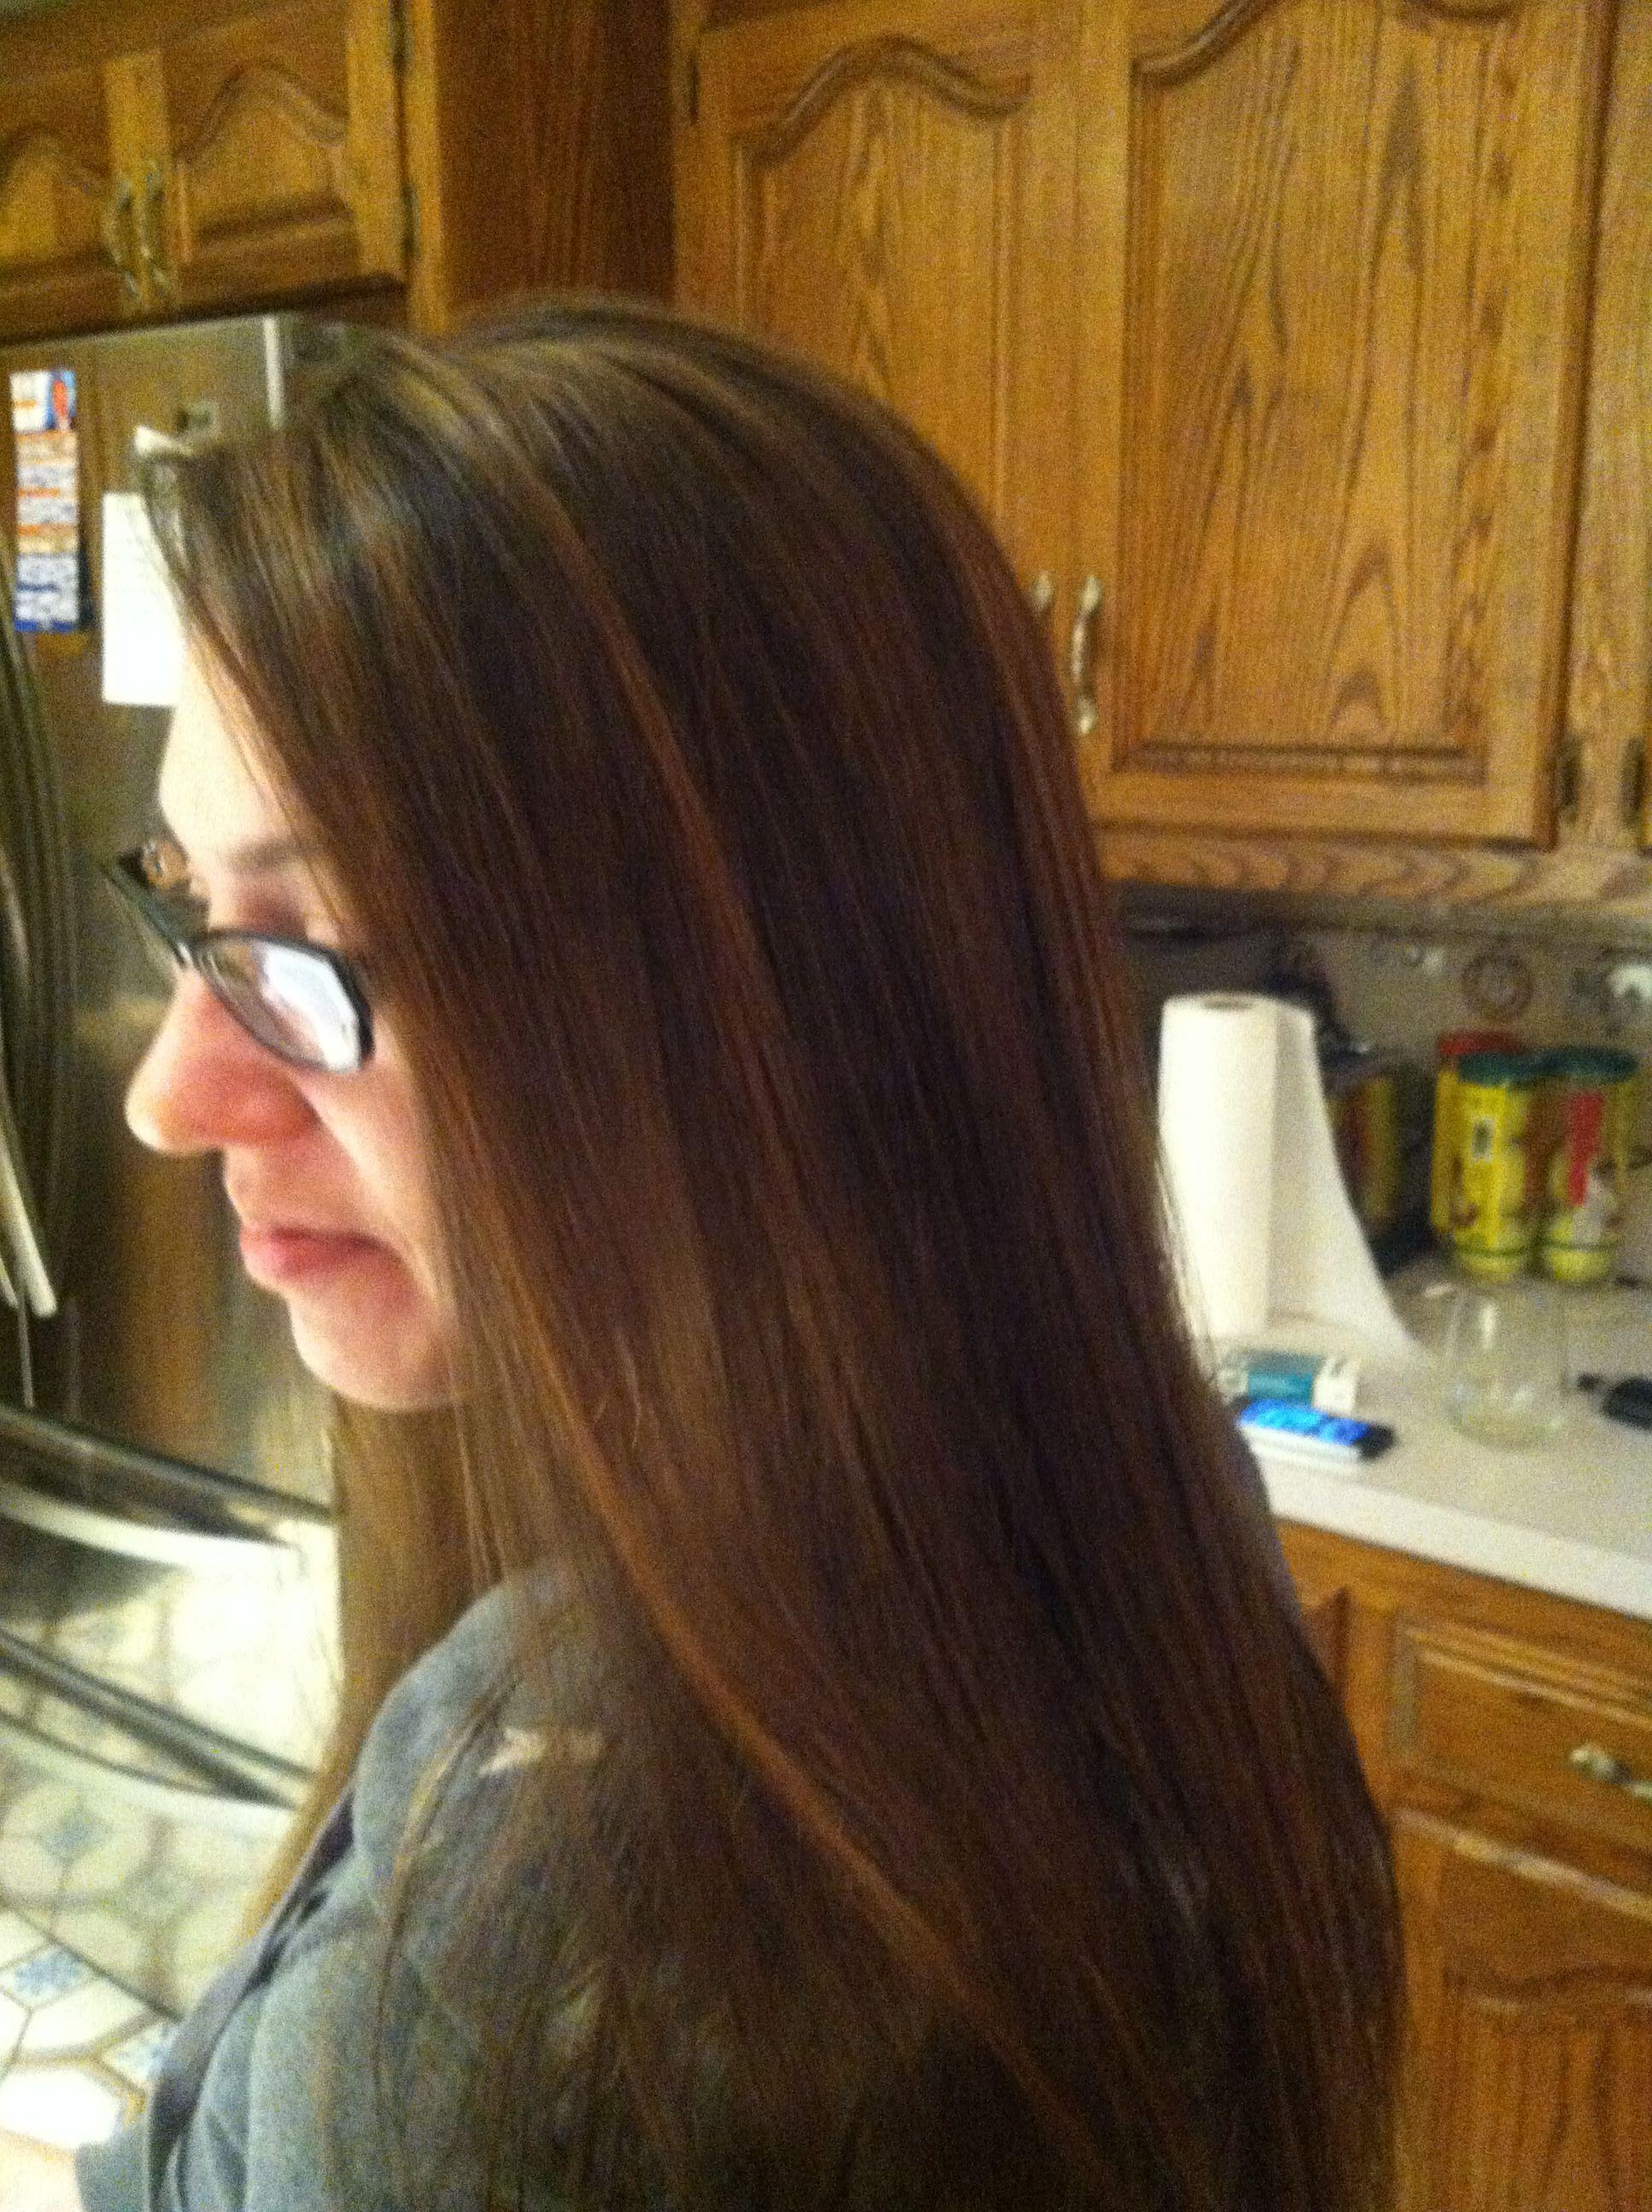 Caramel Highlights On Natural Brown Hair Kaliedekolors In Tan